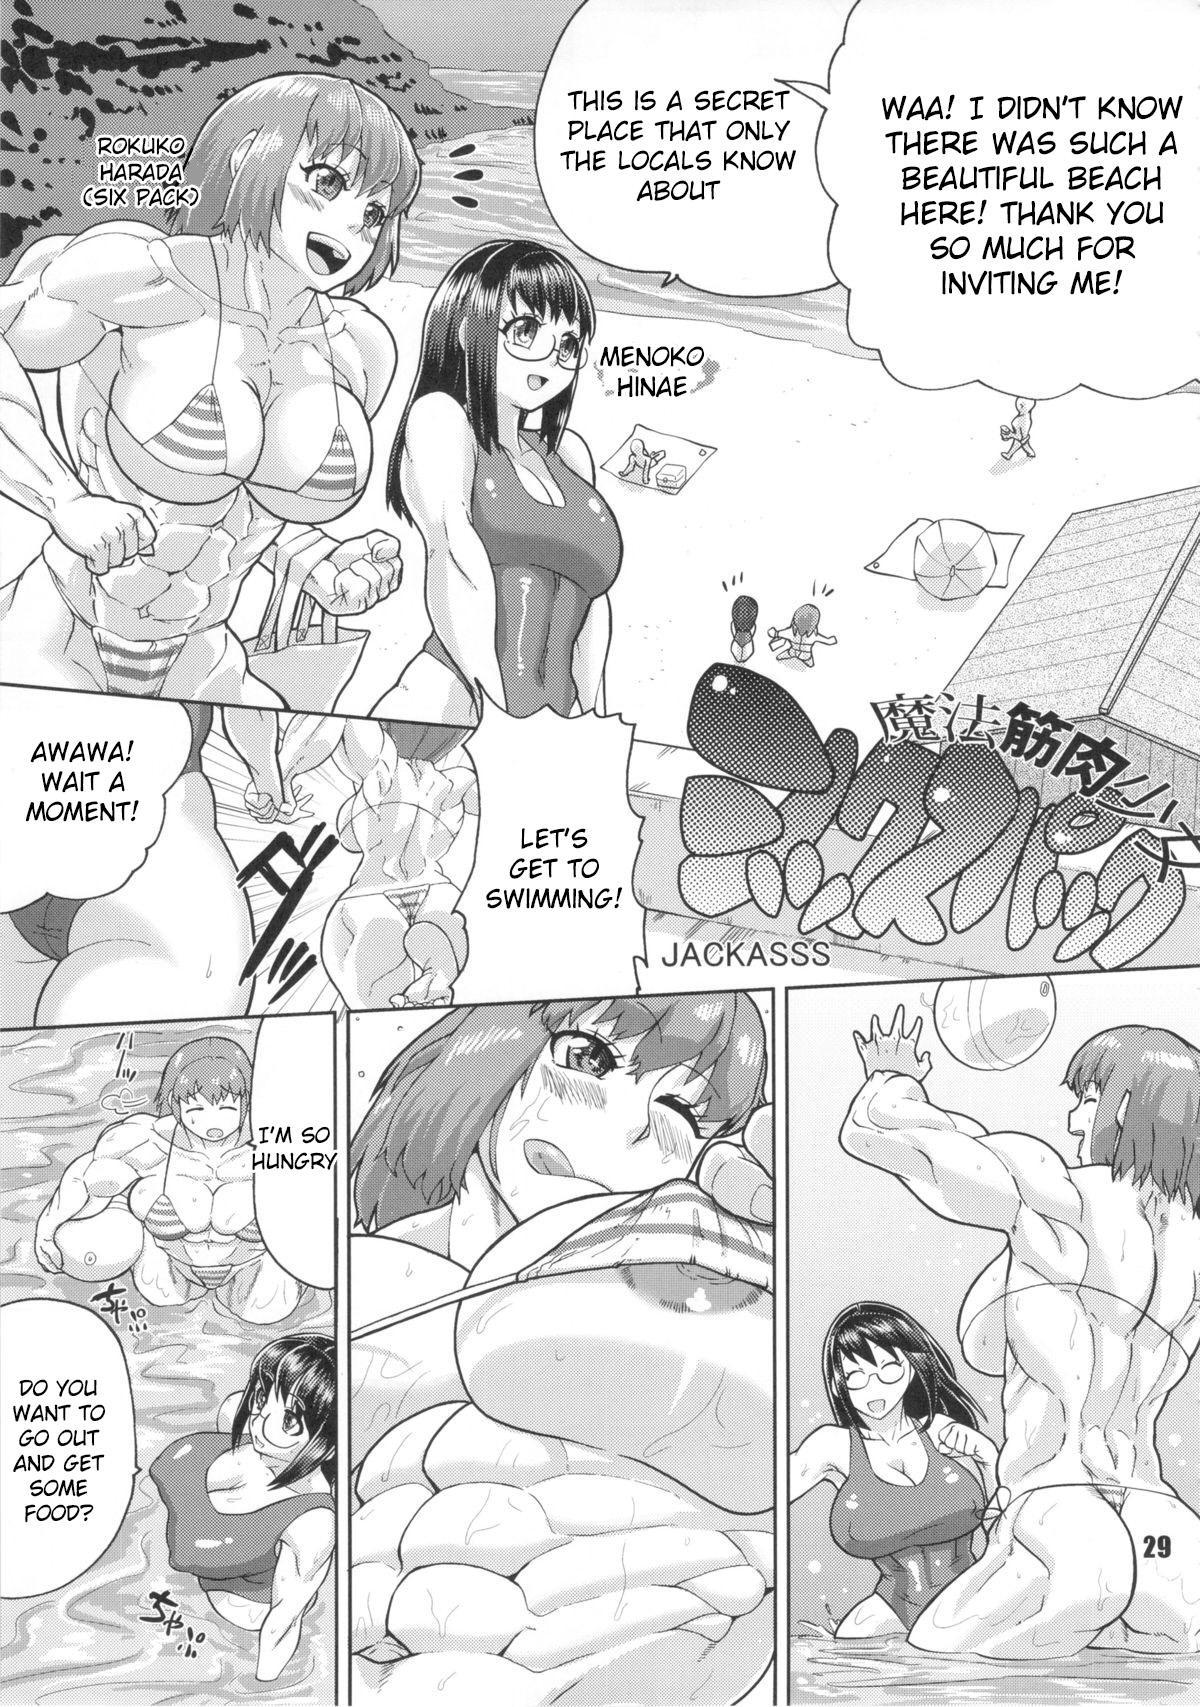 Magic Muscle Girl Six Pack / Jackasss (nWa 7th in Light Heavyweight) ENG (NEO-QUEENDOM Vol. 8) [Raknnkarscans] 0